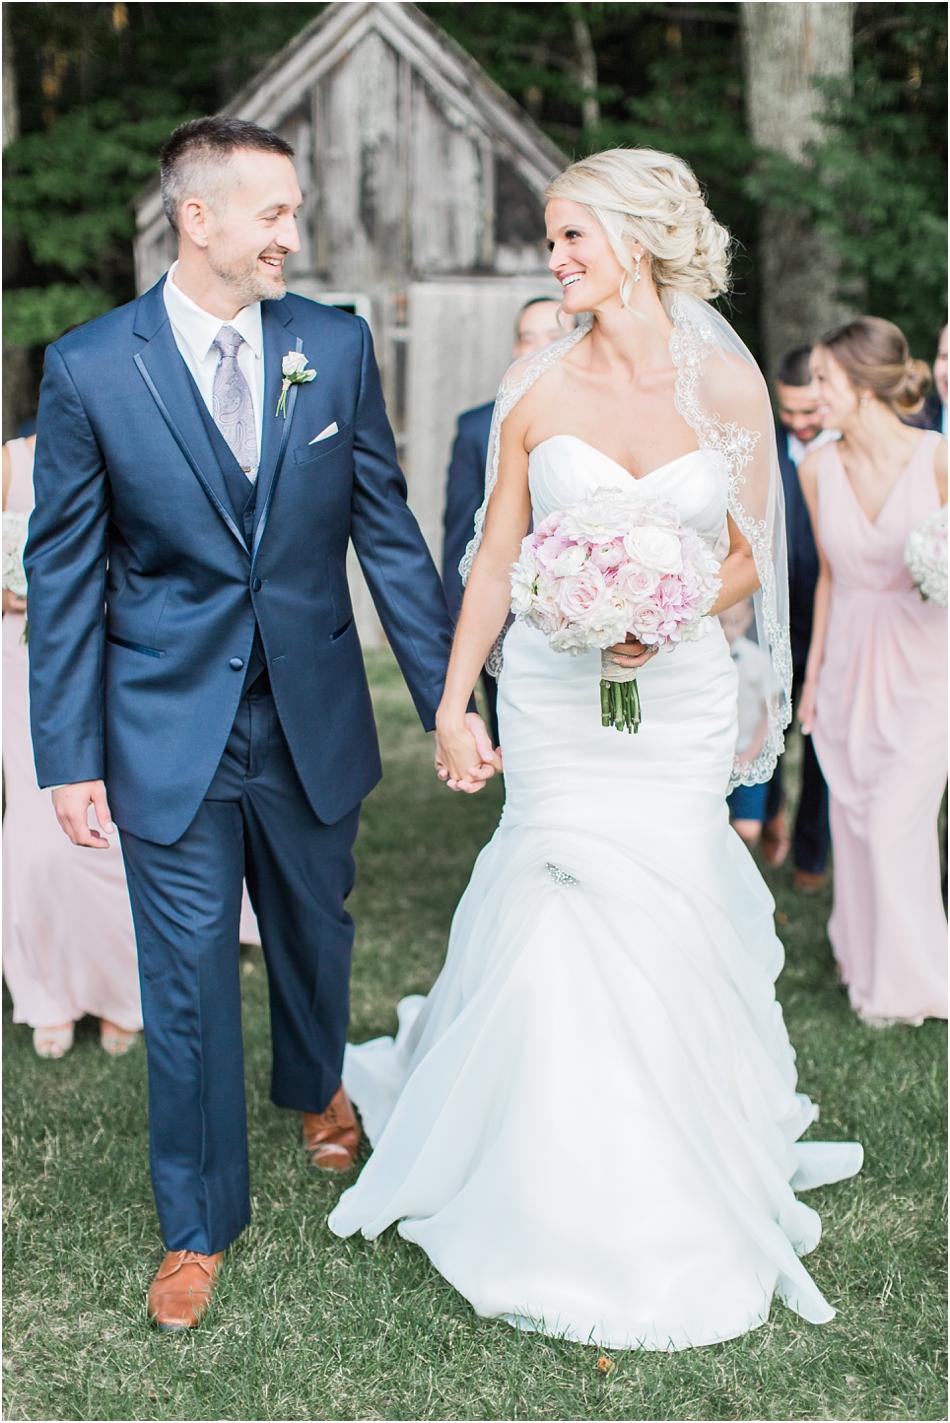 harrington_farm_leominster_sandra_jack_cape_cod_boston_new_england_wedding_photographer_Meredith_Jane_Photography_photo_2290.jpg